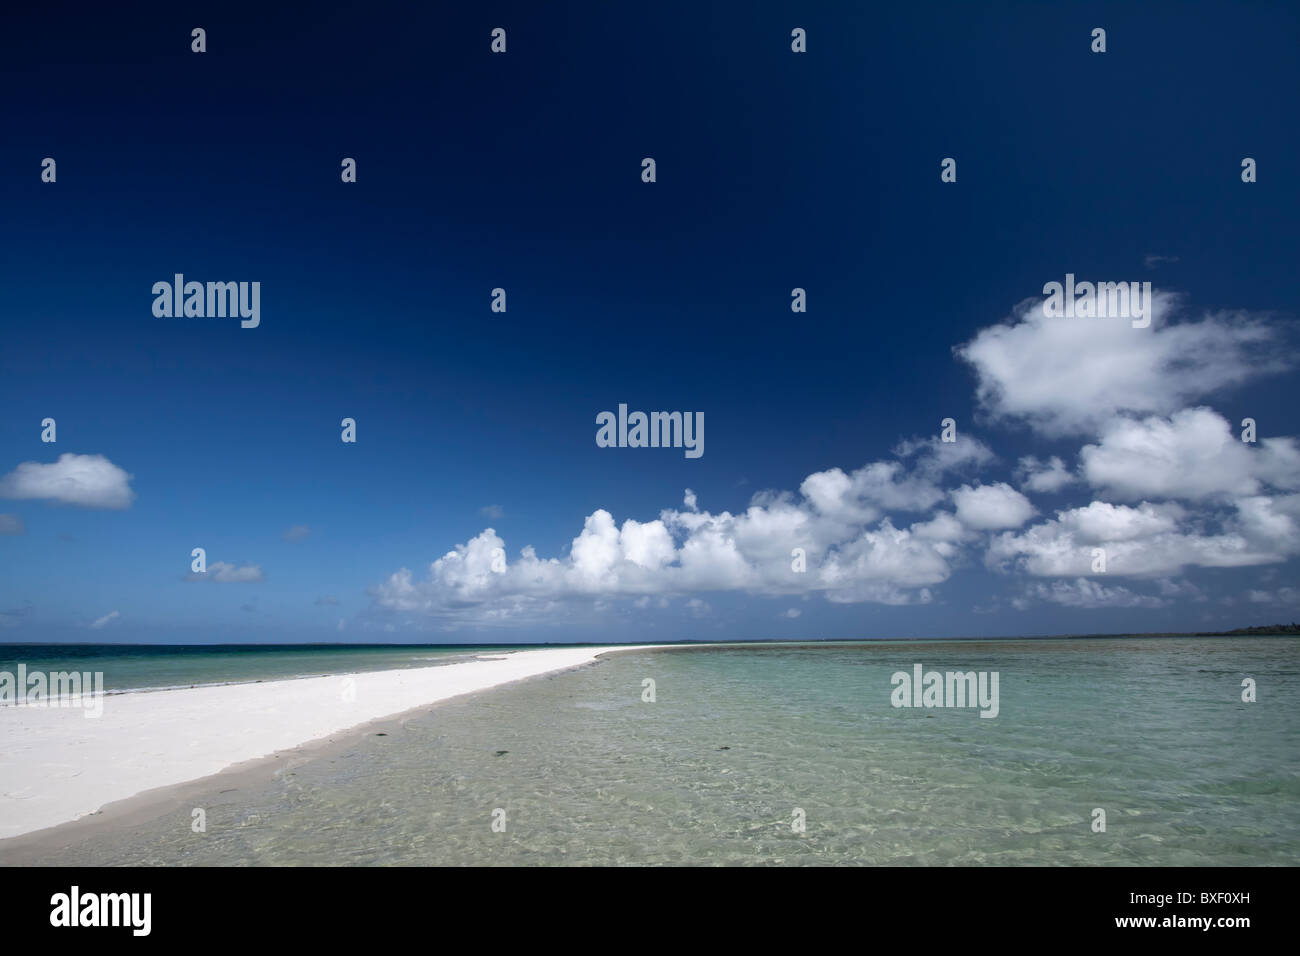 Deserted sandy island in Chole bay, Tanzania - Stock Image